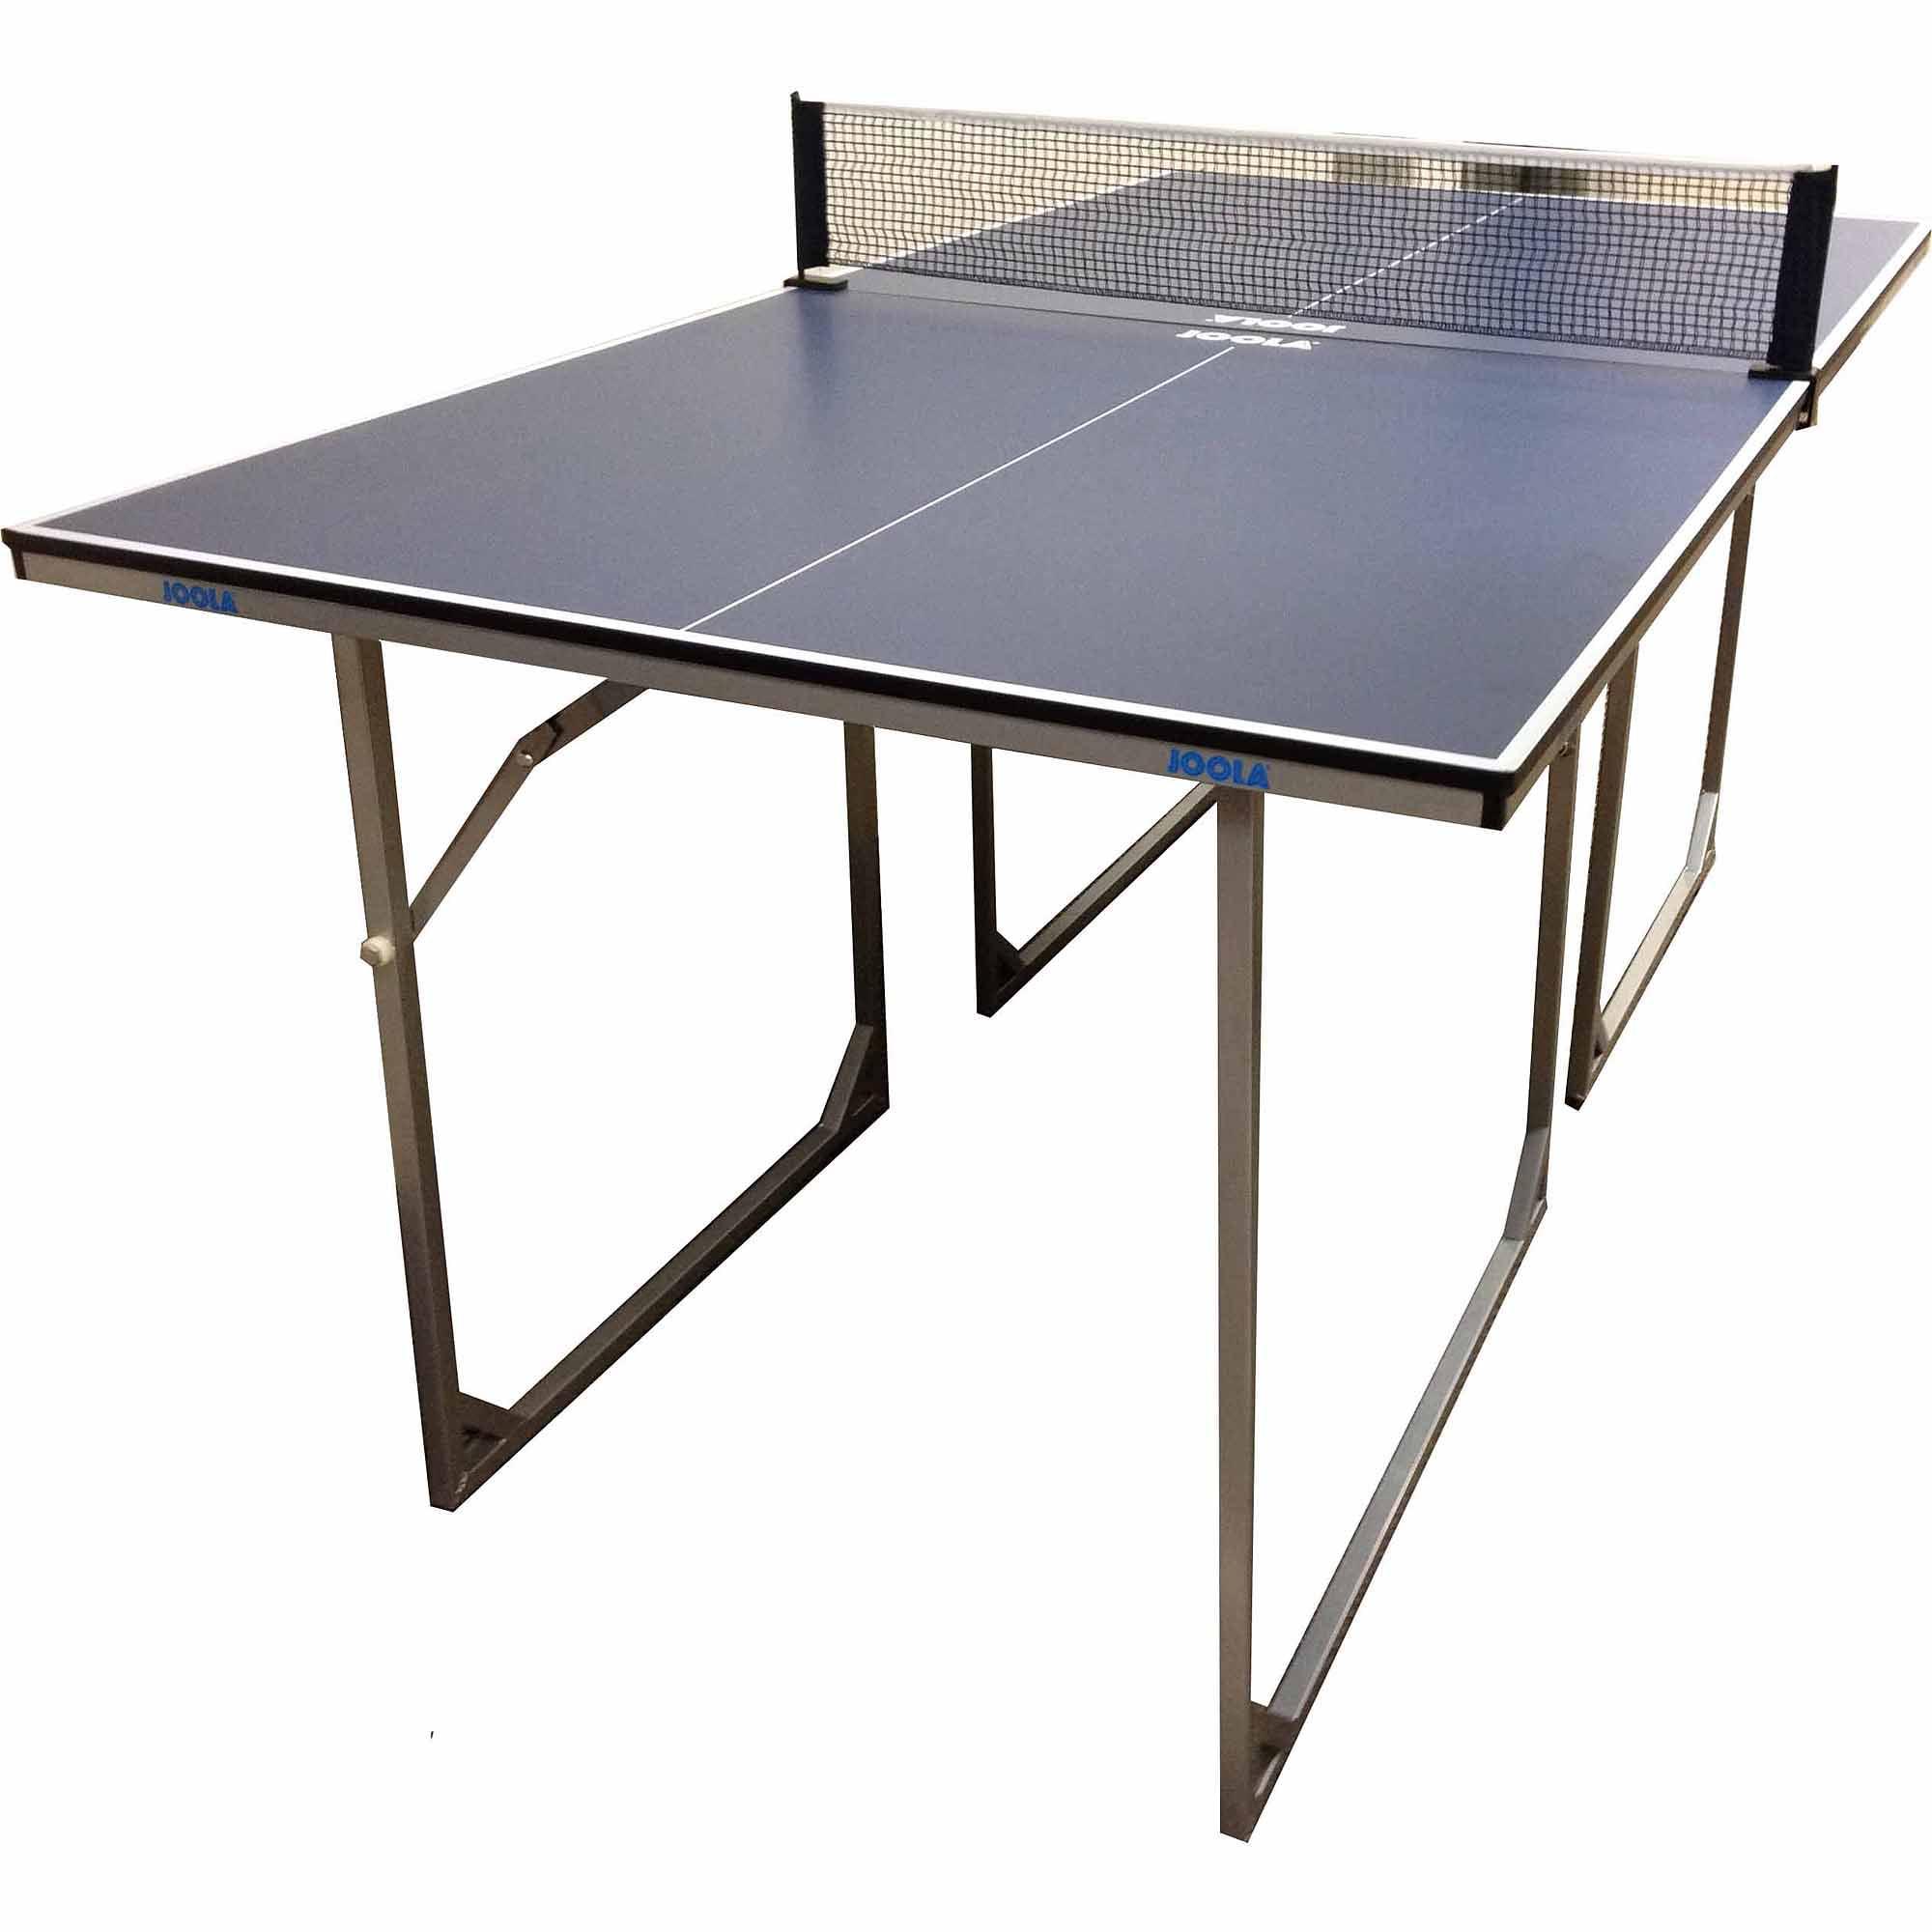 Joola midsize table tennis table 002560191101 ebay for Table tennis 6 0